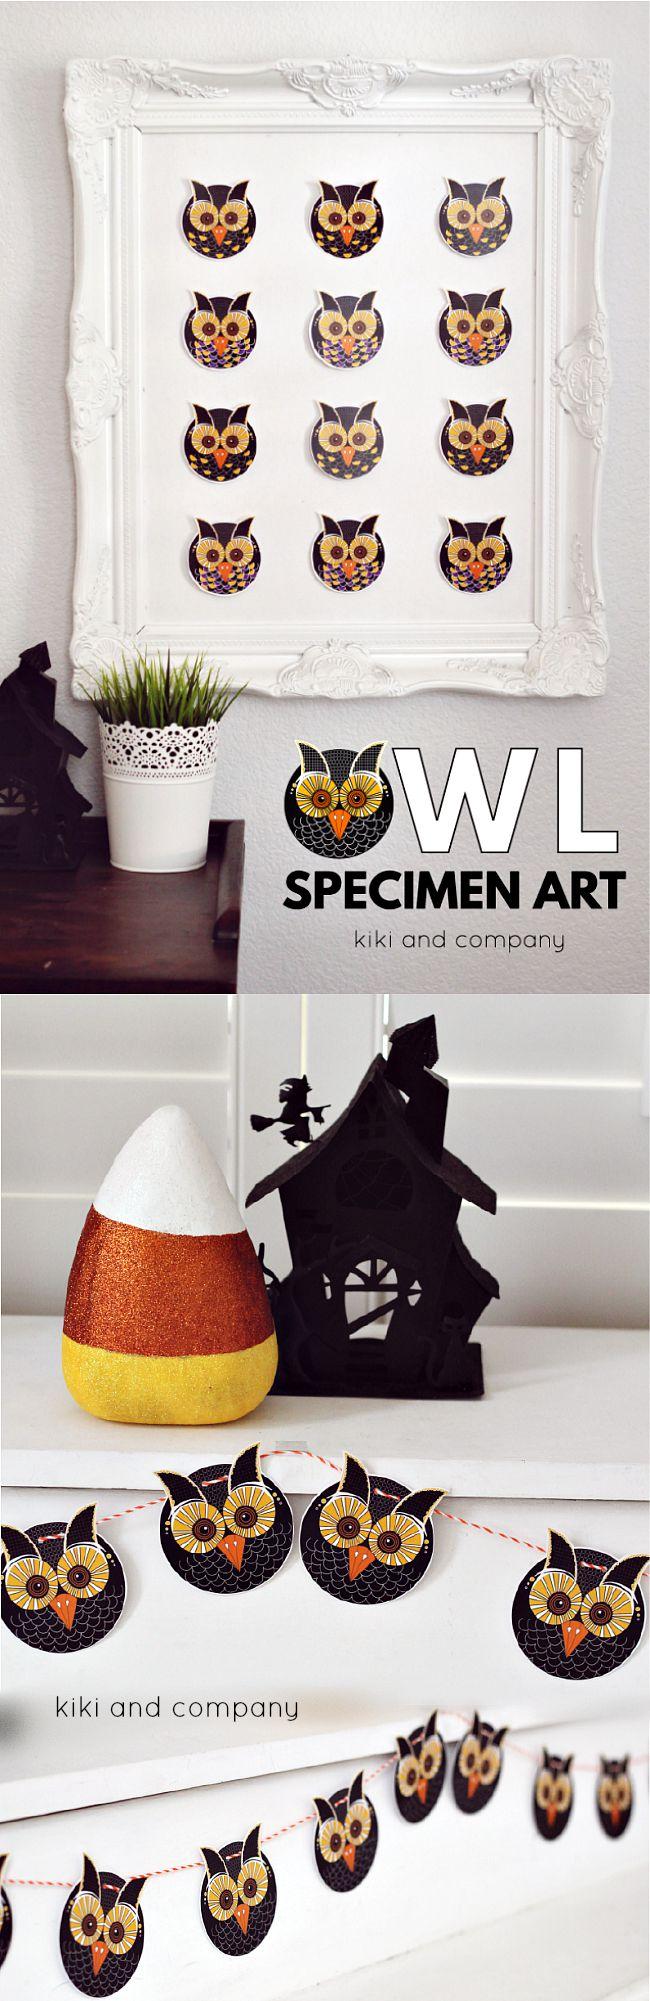 Halloween - Owl-Specimen Art and Free Printable from kikiandcompany ...Super cute!